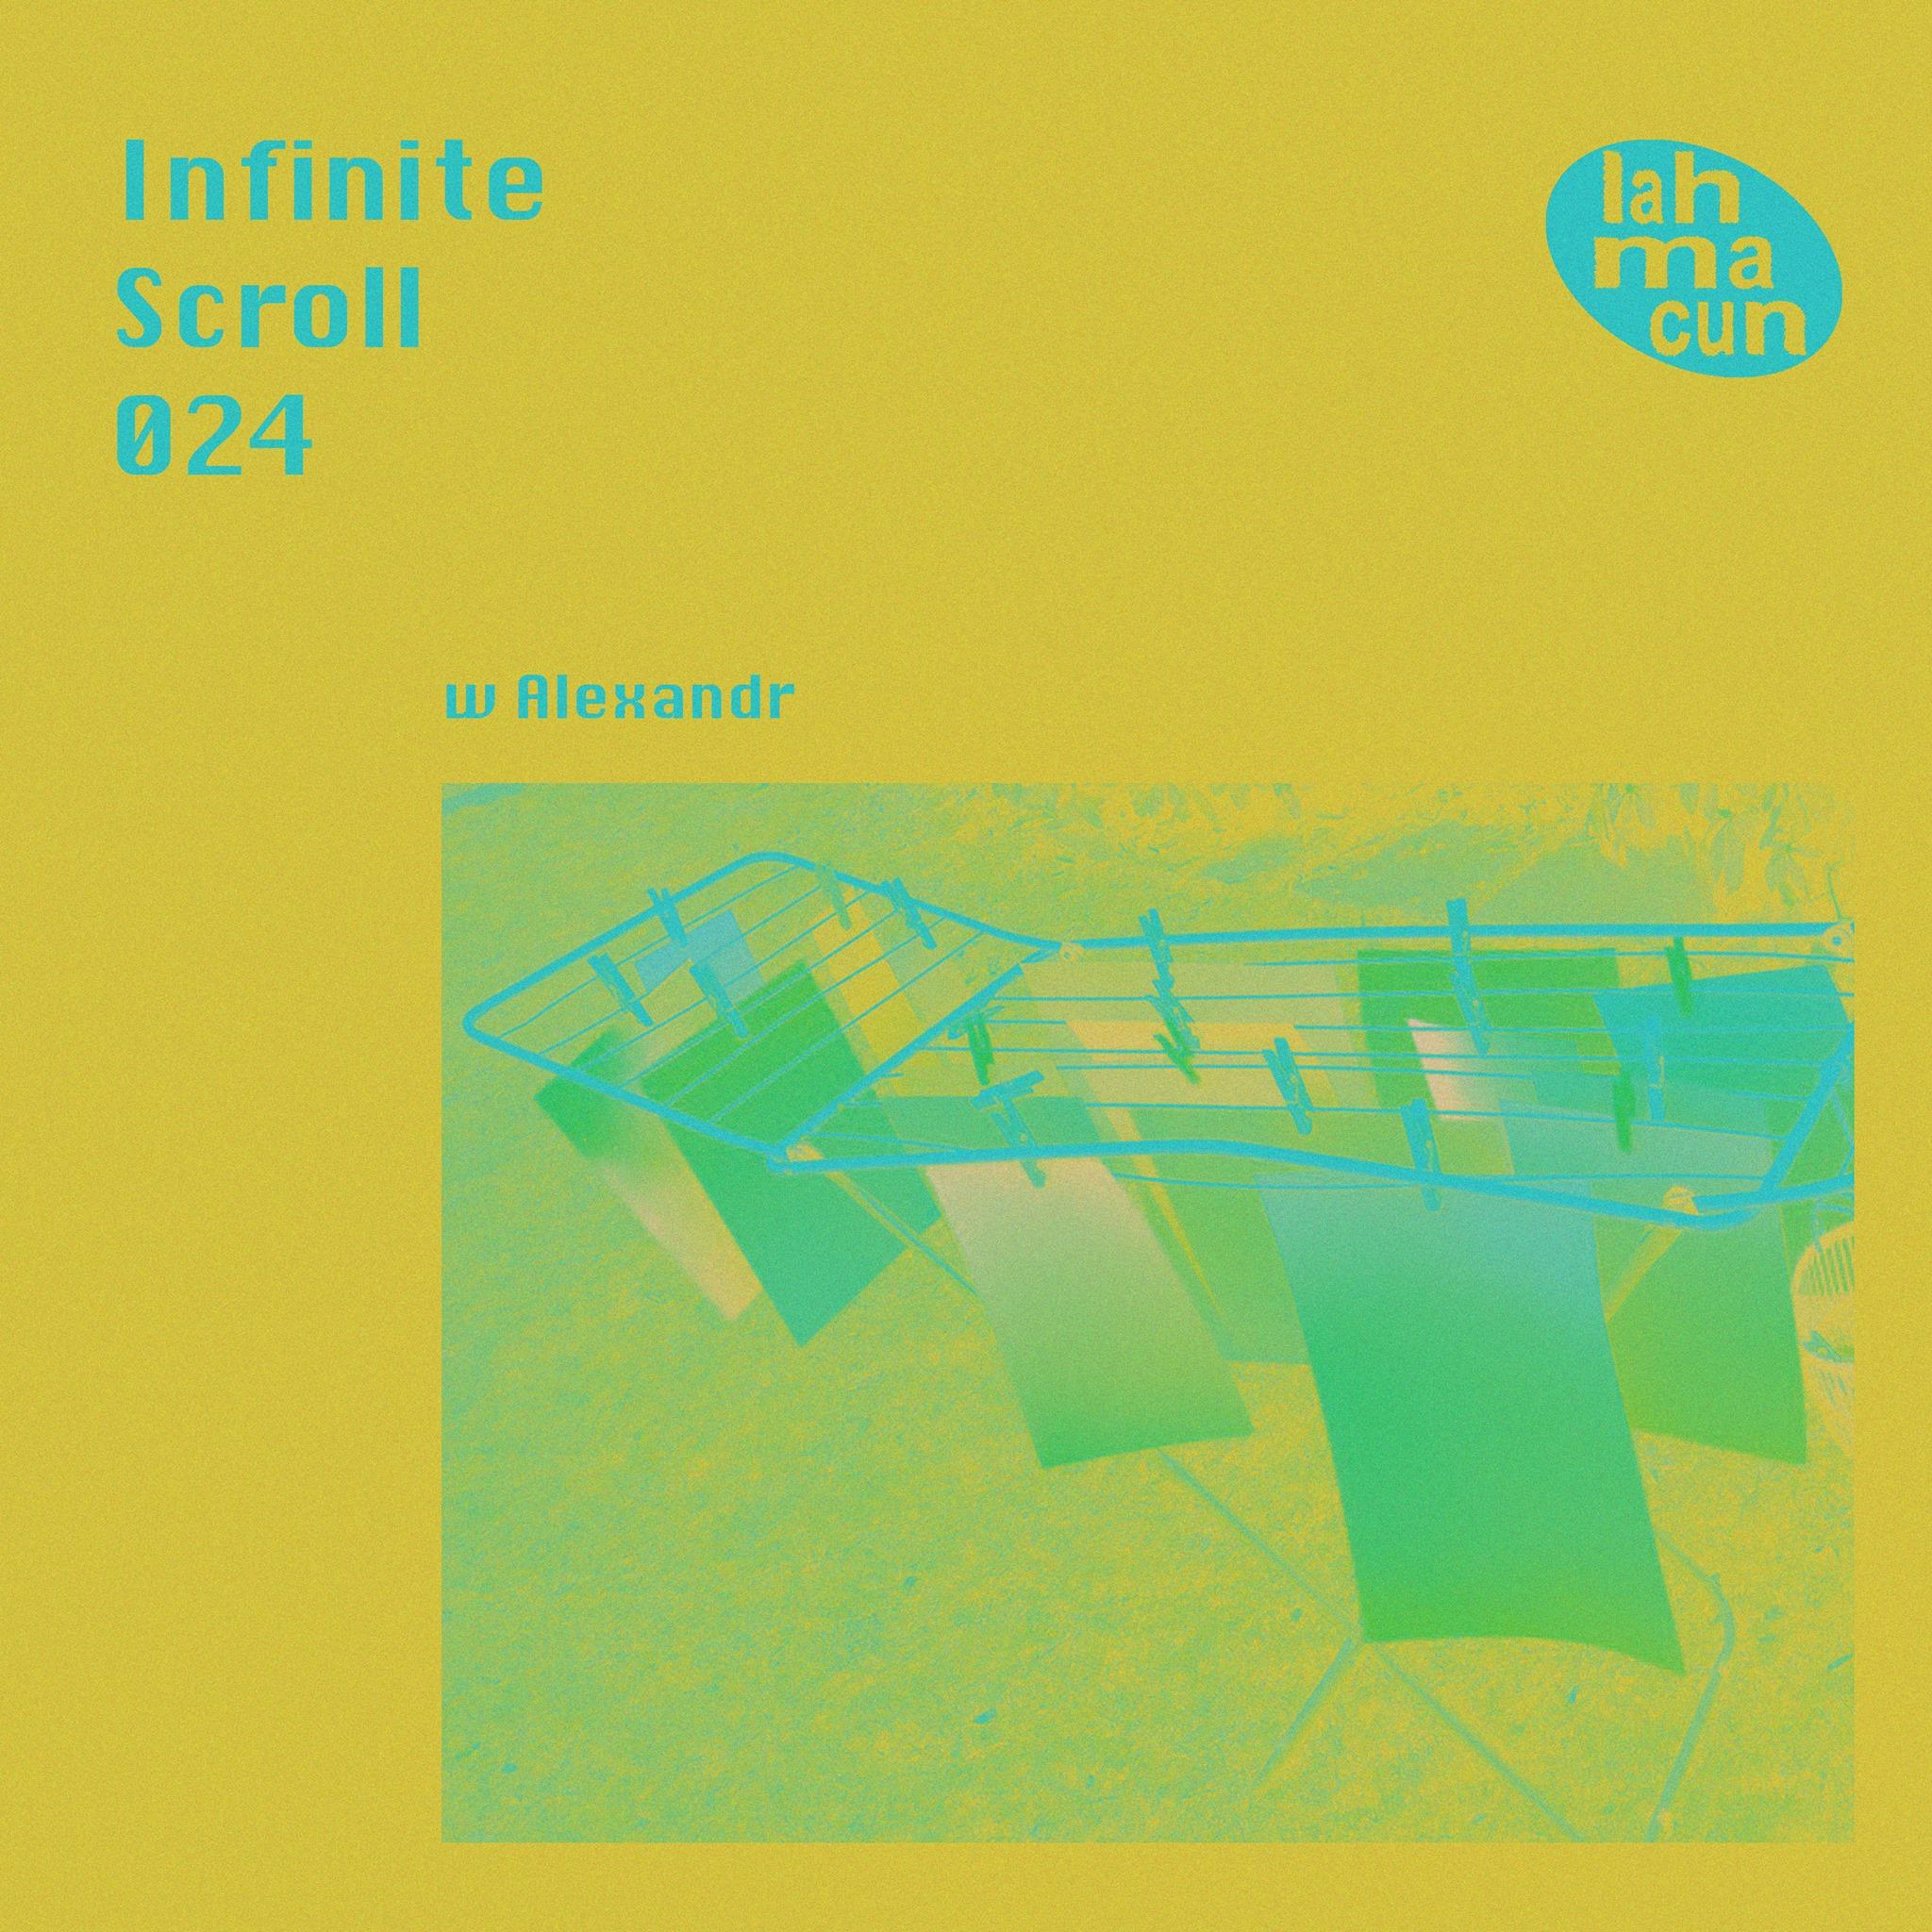 Infinite Scroll 024 w/ Alexandr